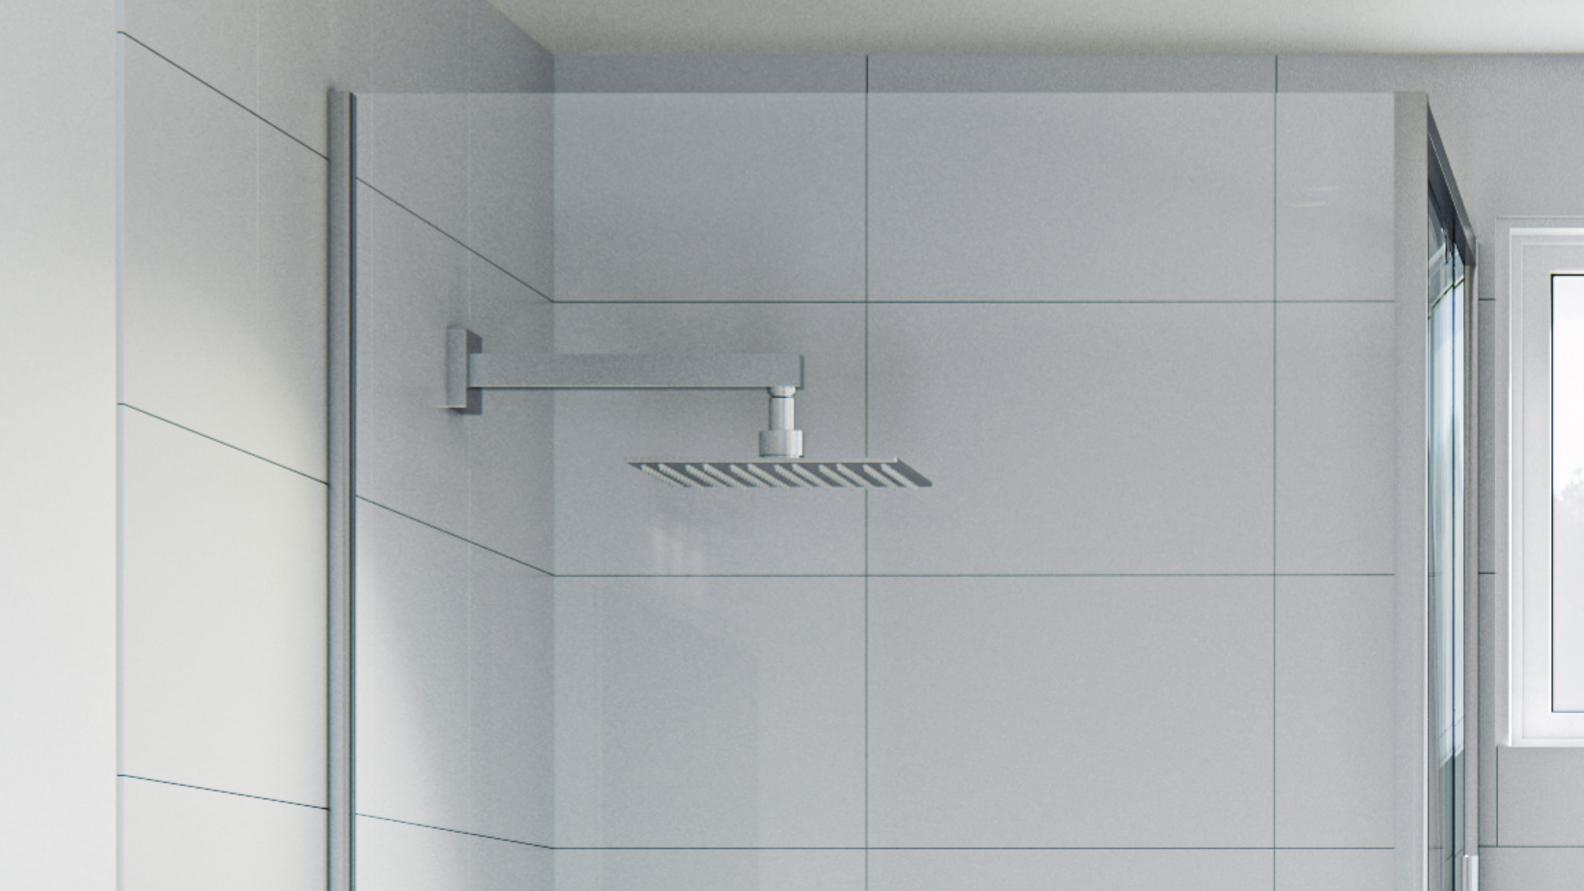 Wall-mounted showerhead.